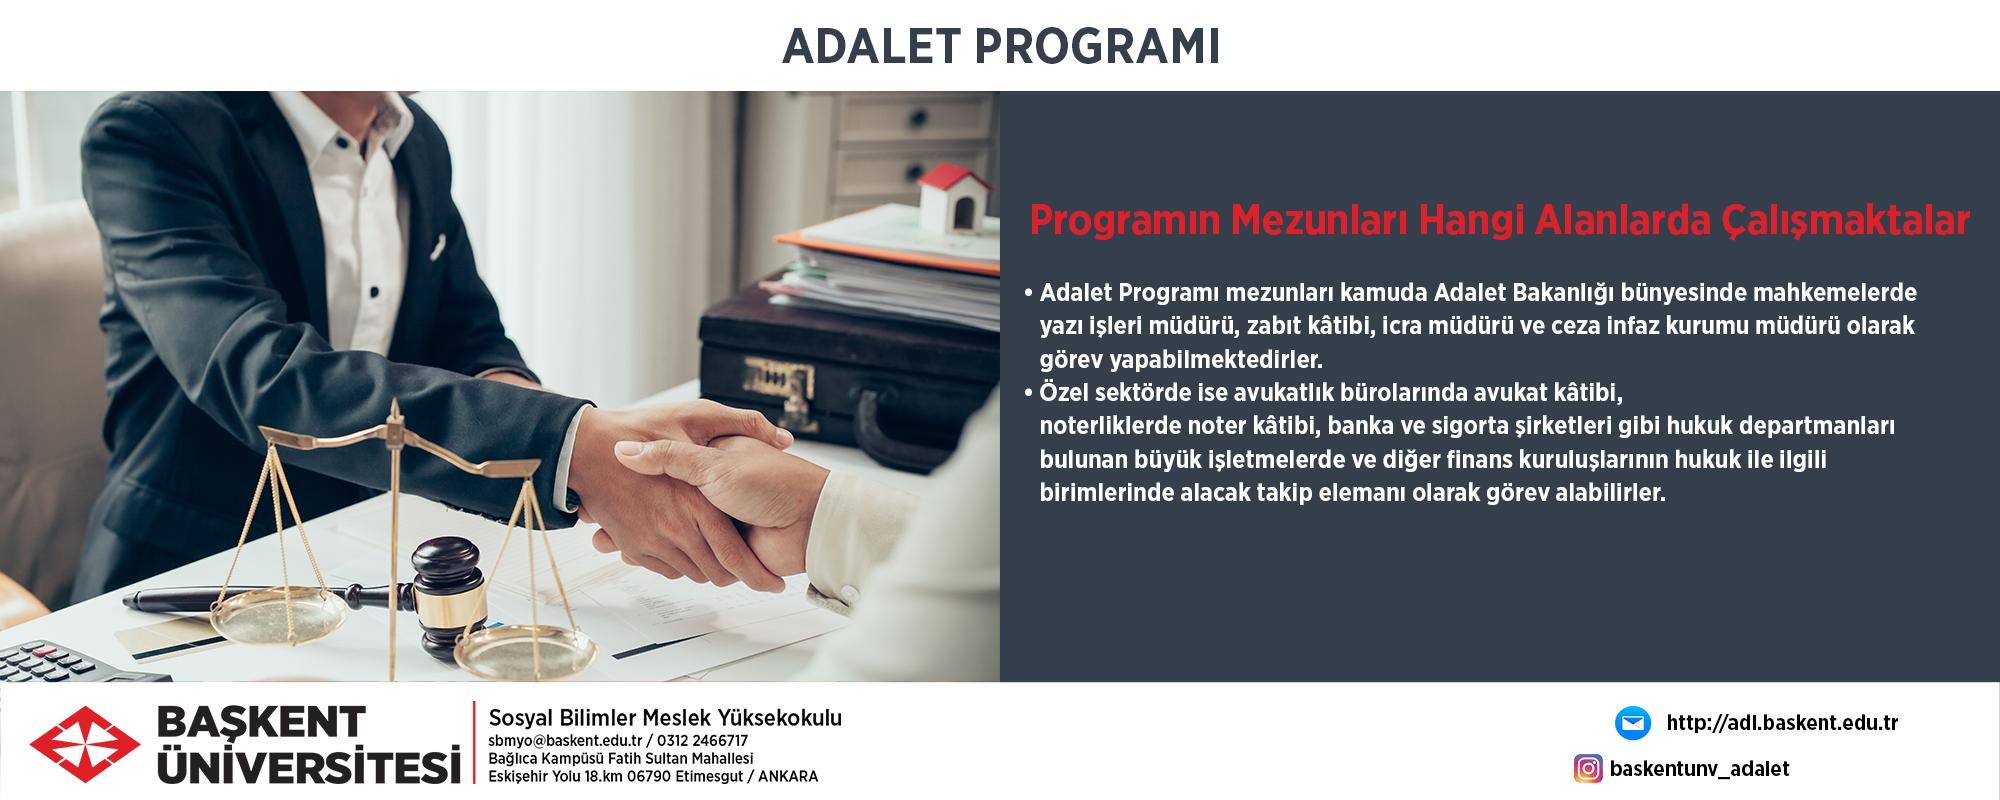 adalet programi baskent universitesi